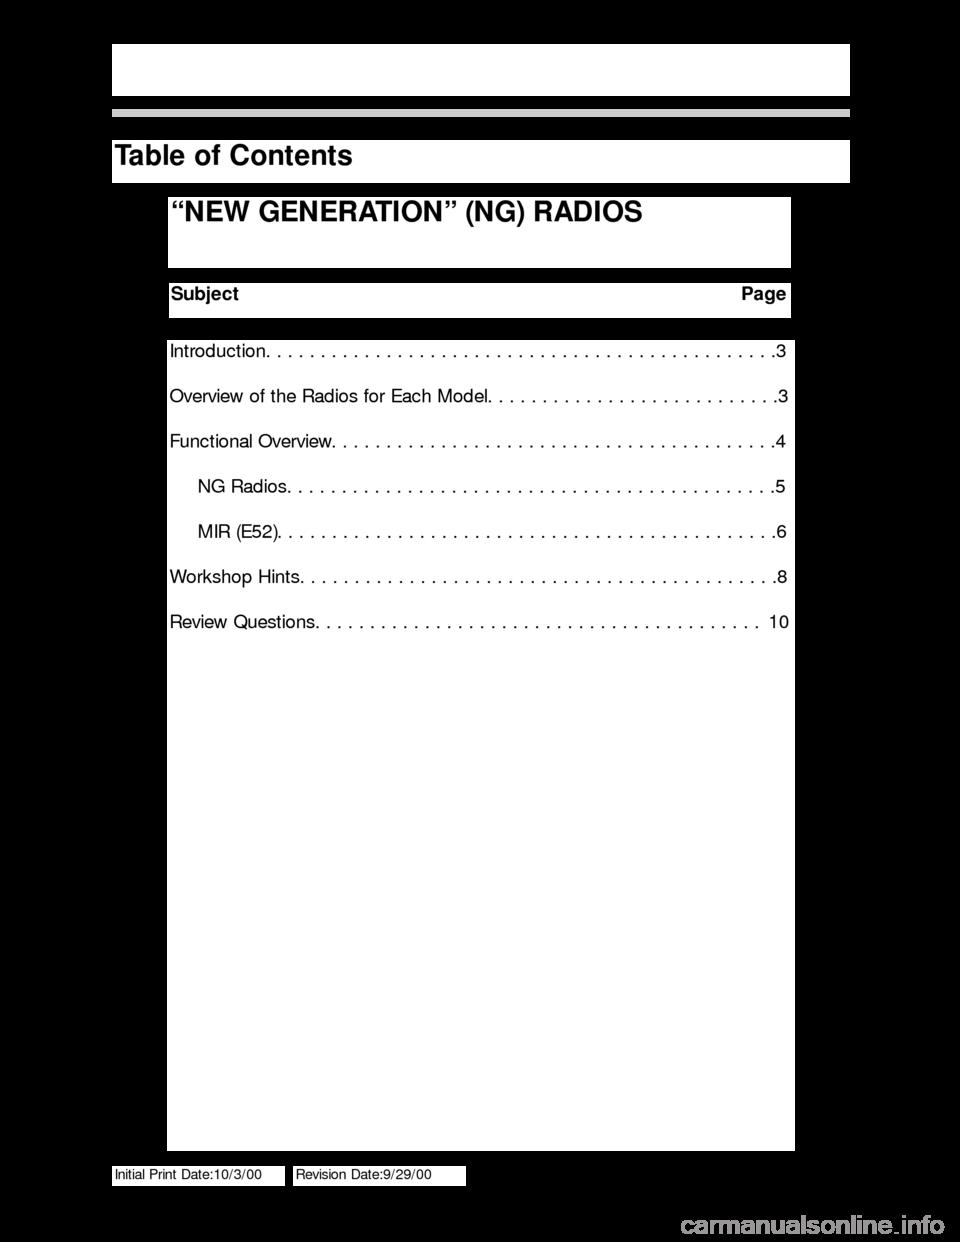 Bmw 3 Series 2005 E46 New Generation Radios Manual Light Control Module Wiring Diagram